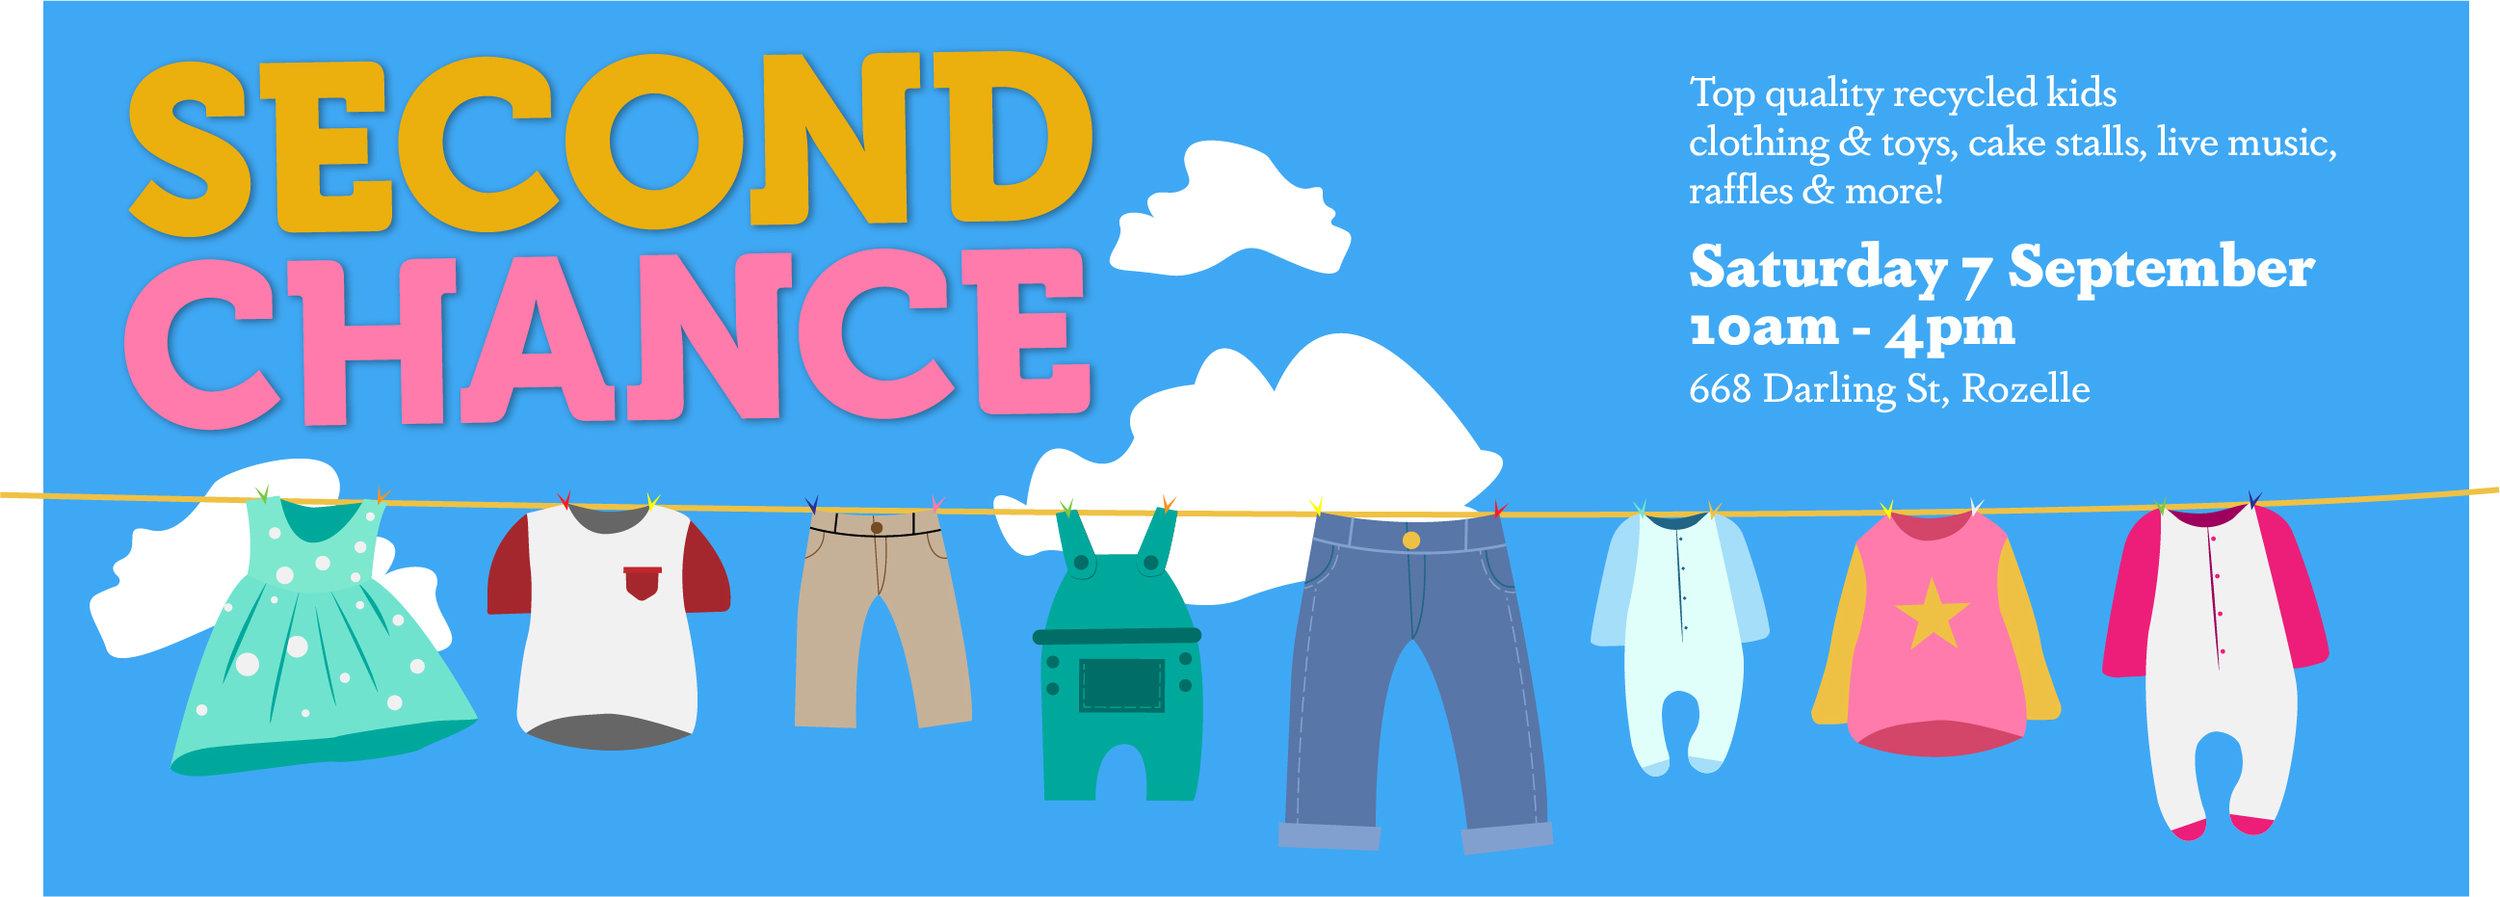 SecondChance_WebandFBBanners.jpg